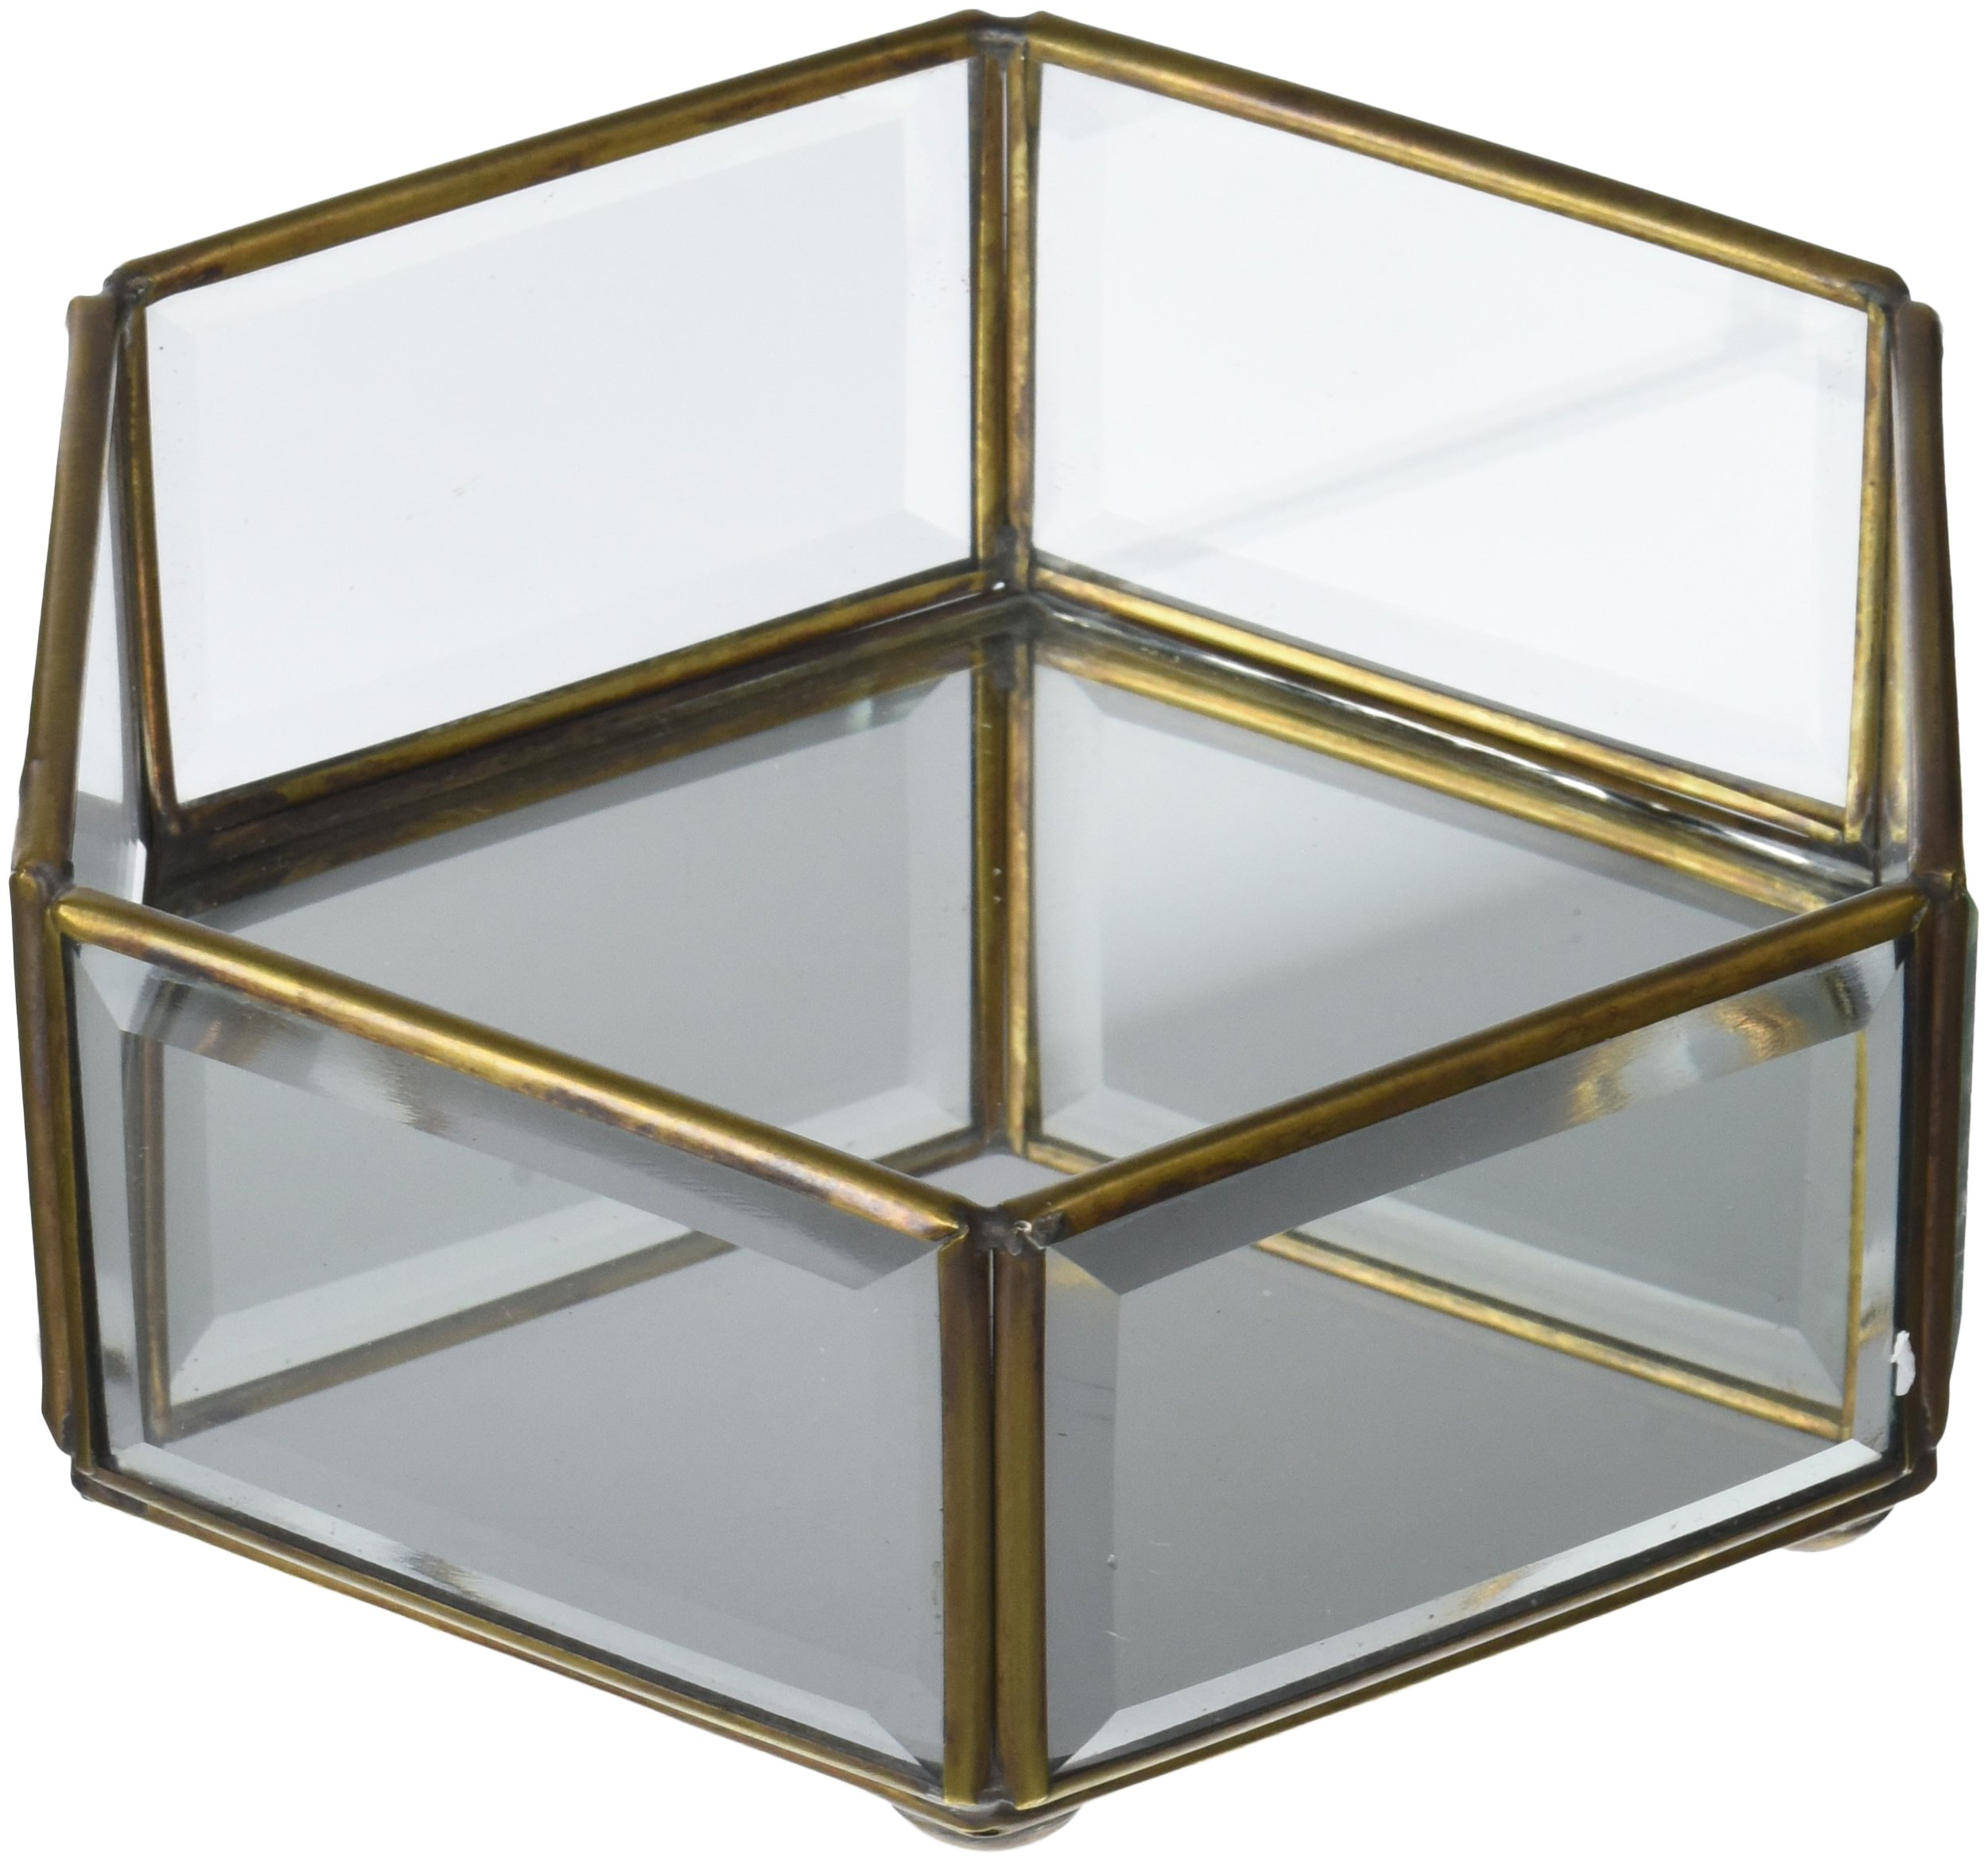 Moycor Caja Hexagonal Cristal, Dorado, 0.45 Kg: Amazon.es: Hogar